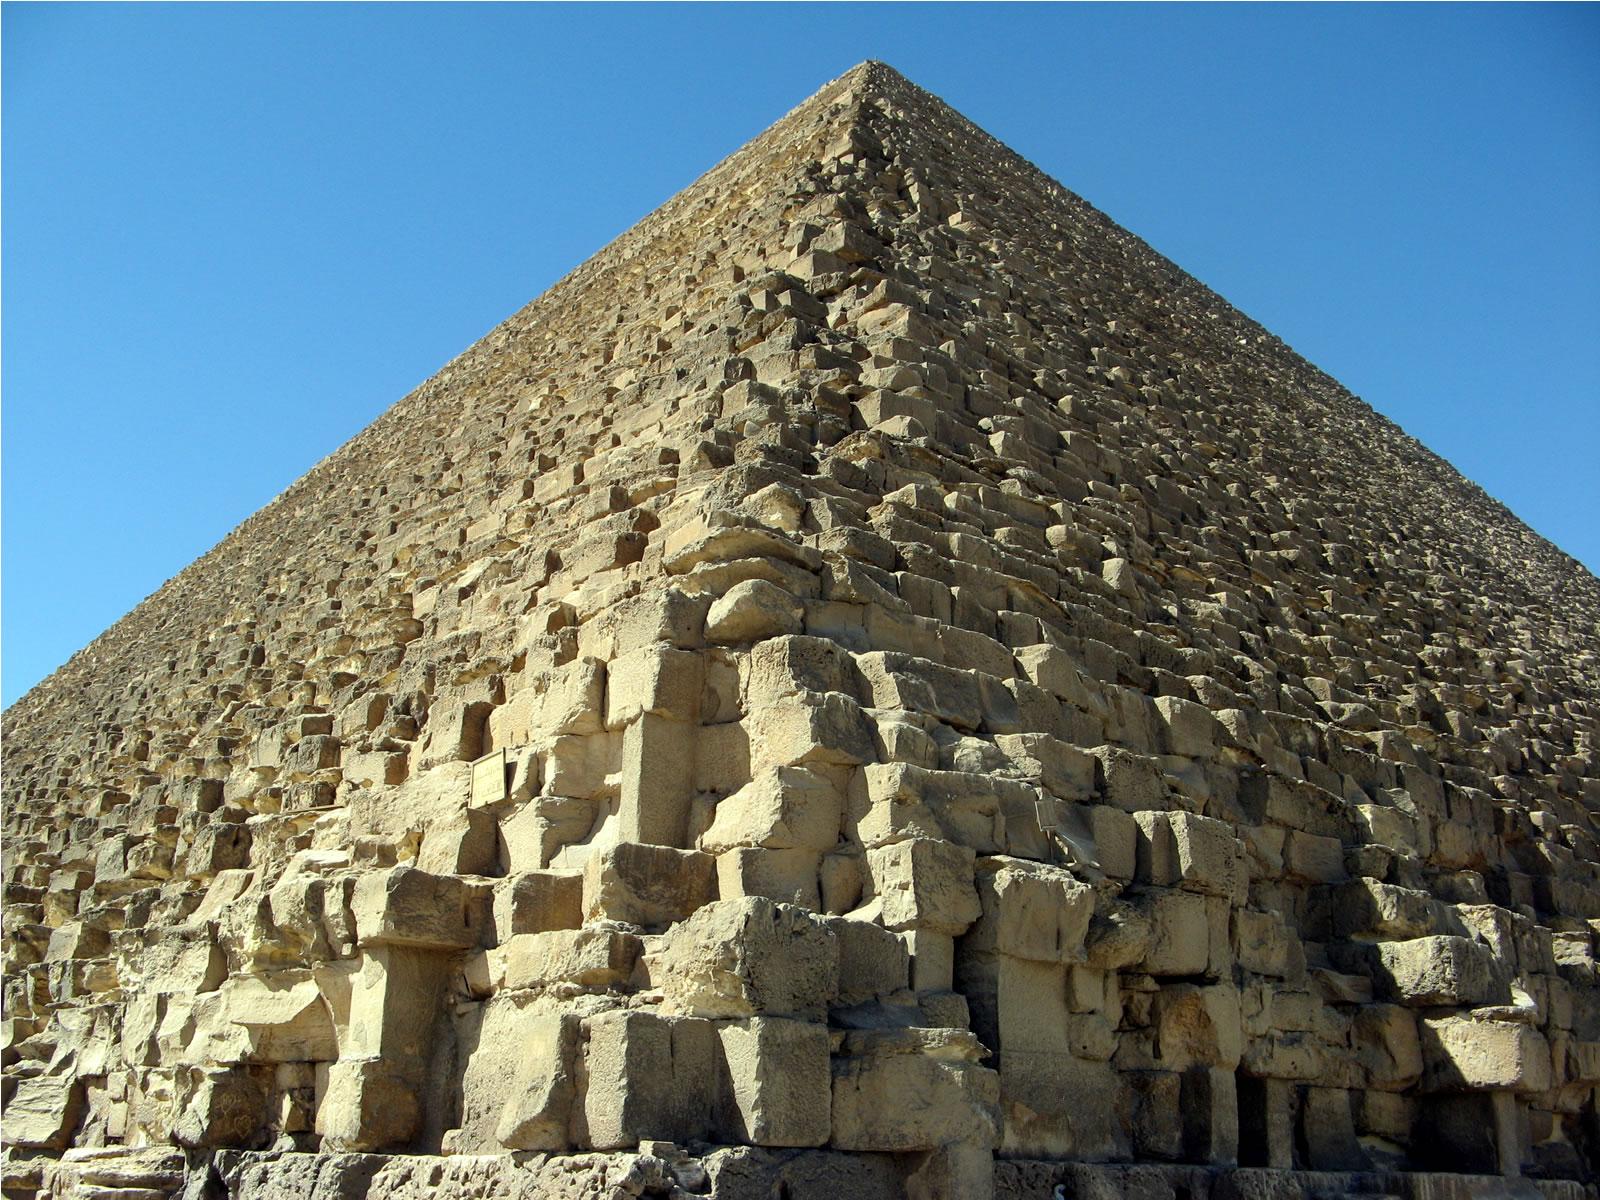 http://2.bp.blogspot.com/-iCWiAr6R1-M/TsUNN4PaJwI/AAAAAAAAFKg/BMxQI2bLwQ8/s1600/egypt+unique+wallpapers.jpg